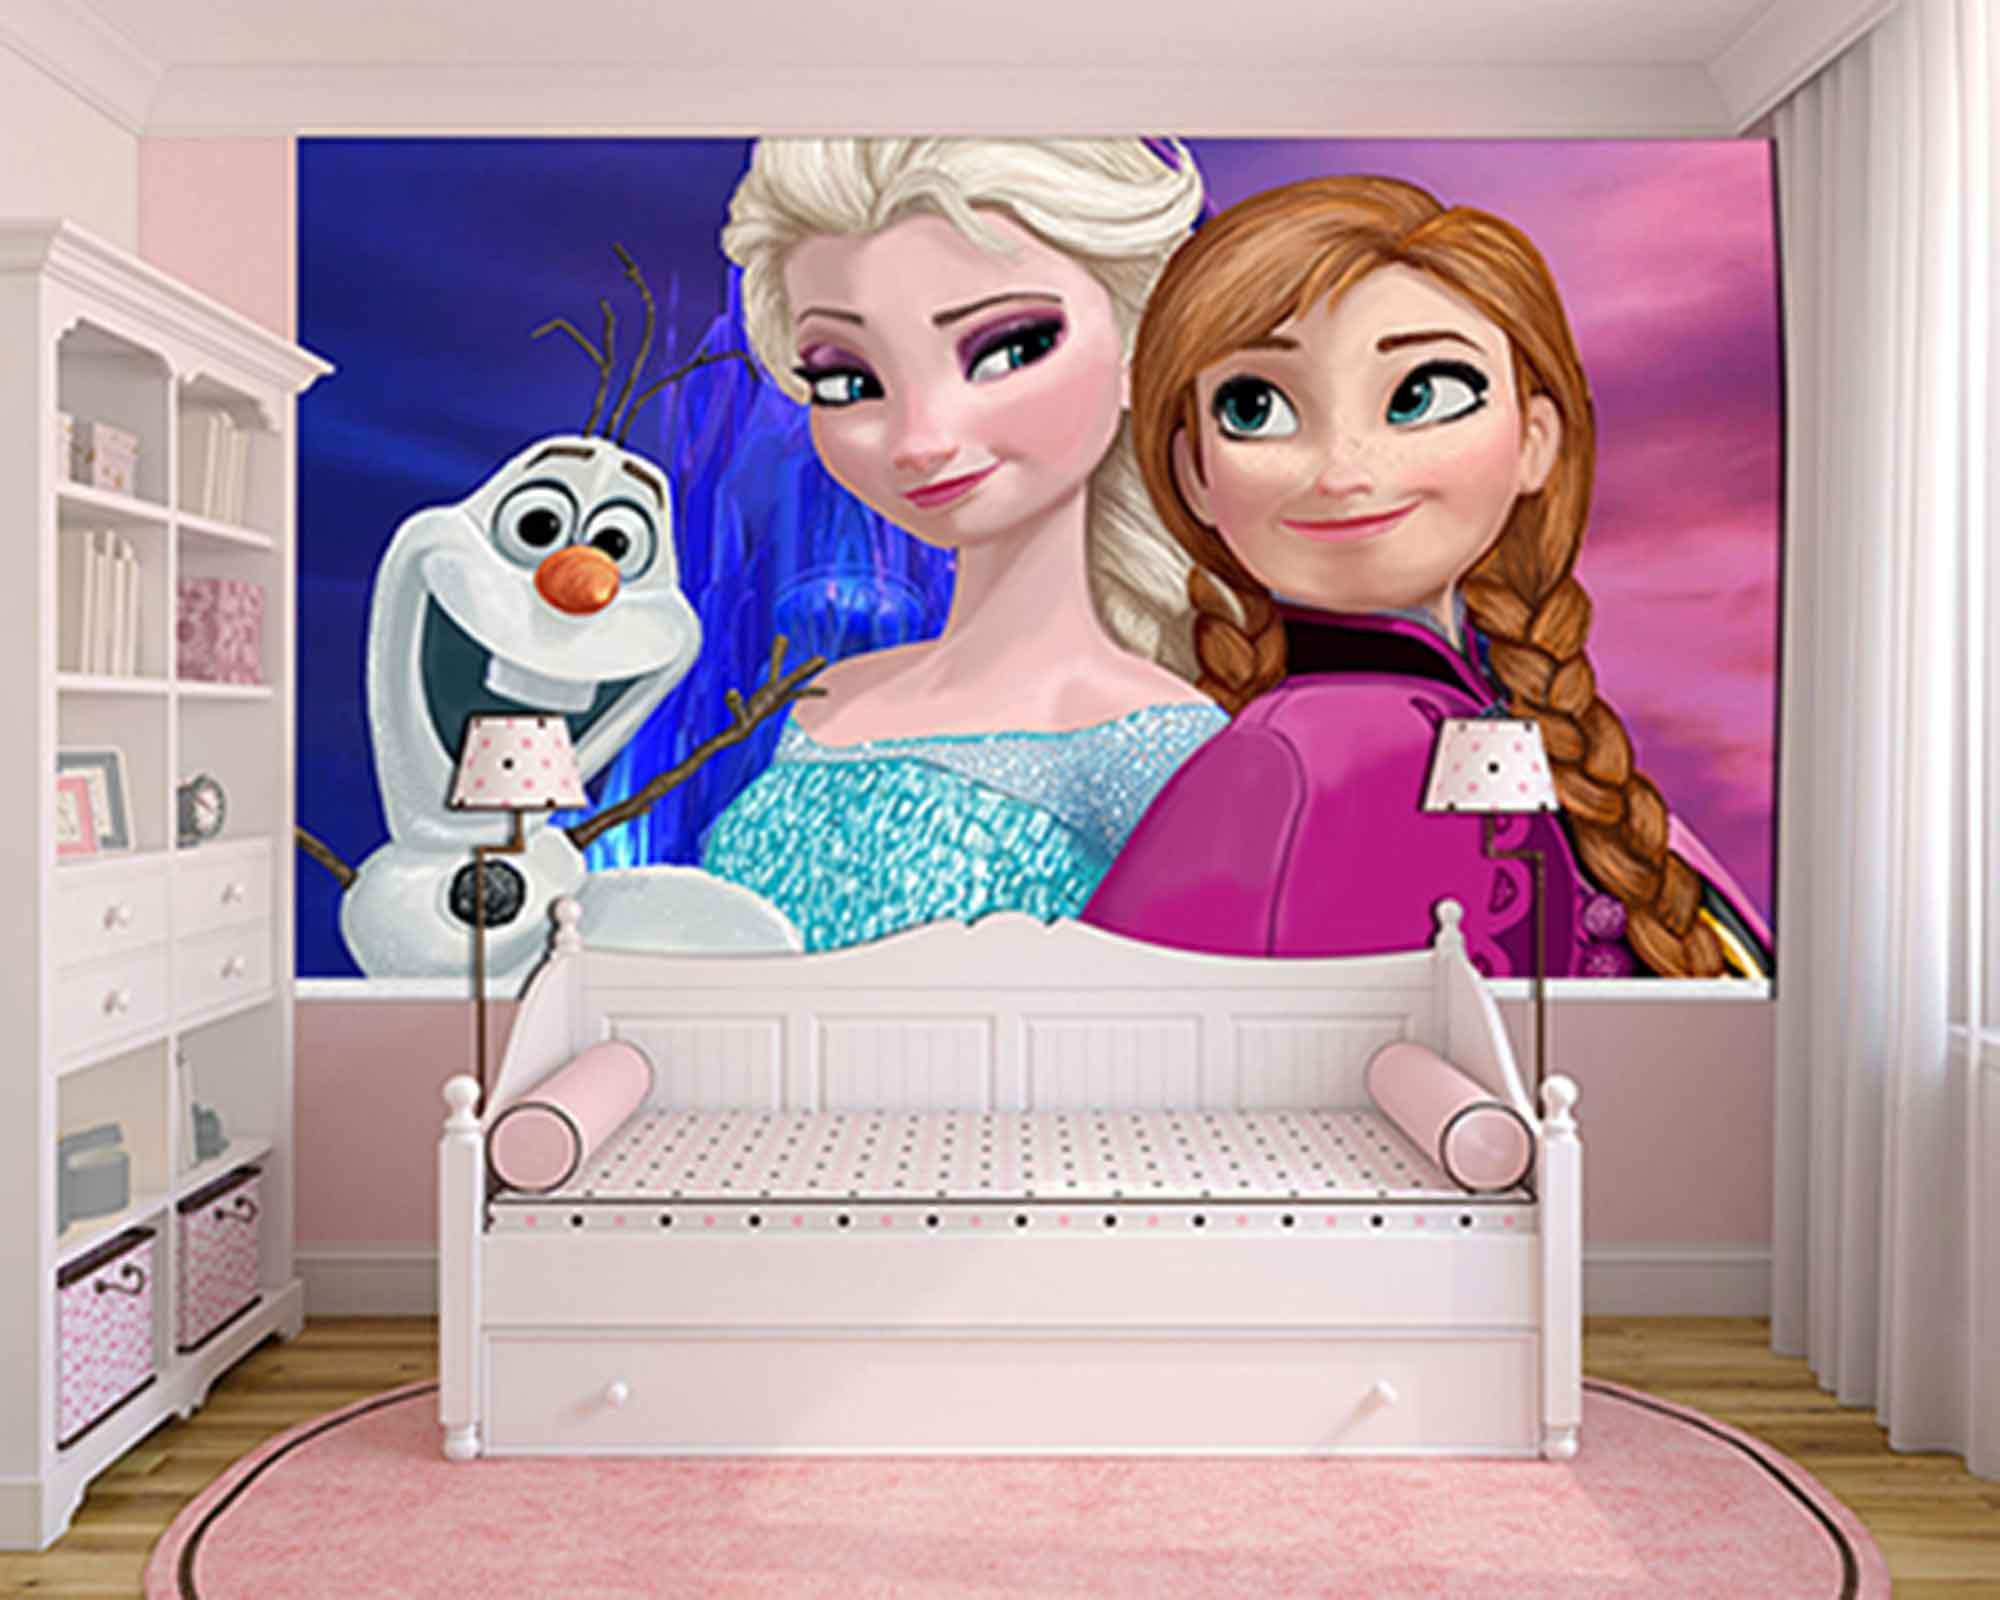 Papel de Parede Infantil Frozen 0014 - Papel de Parede para Quarto  - Paredes Decoradas